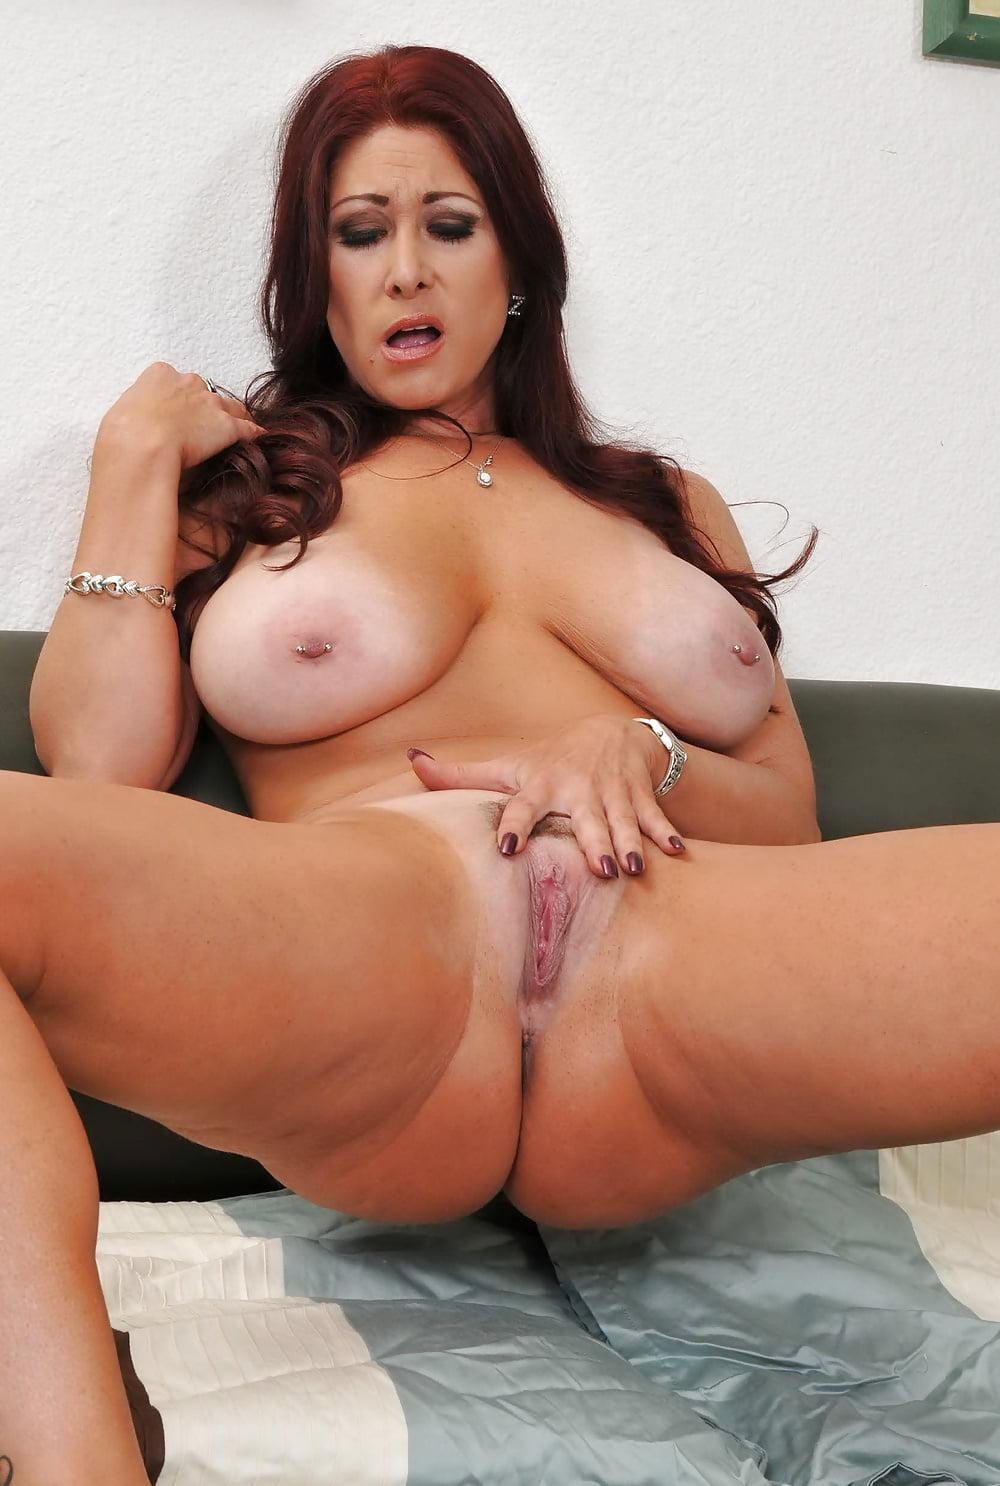 Milf porn tits gallery — photo 5